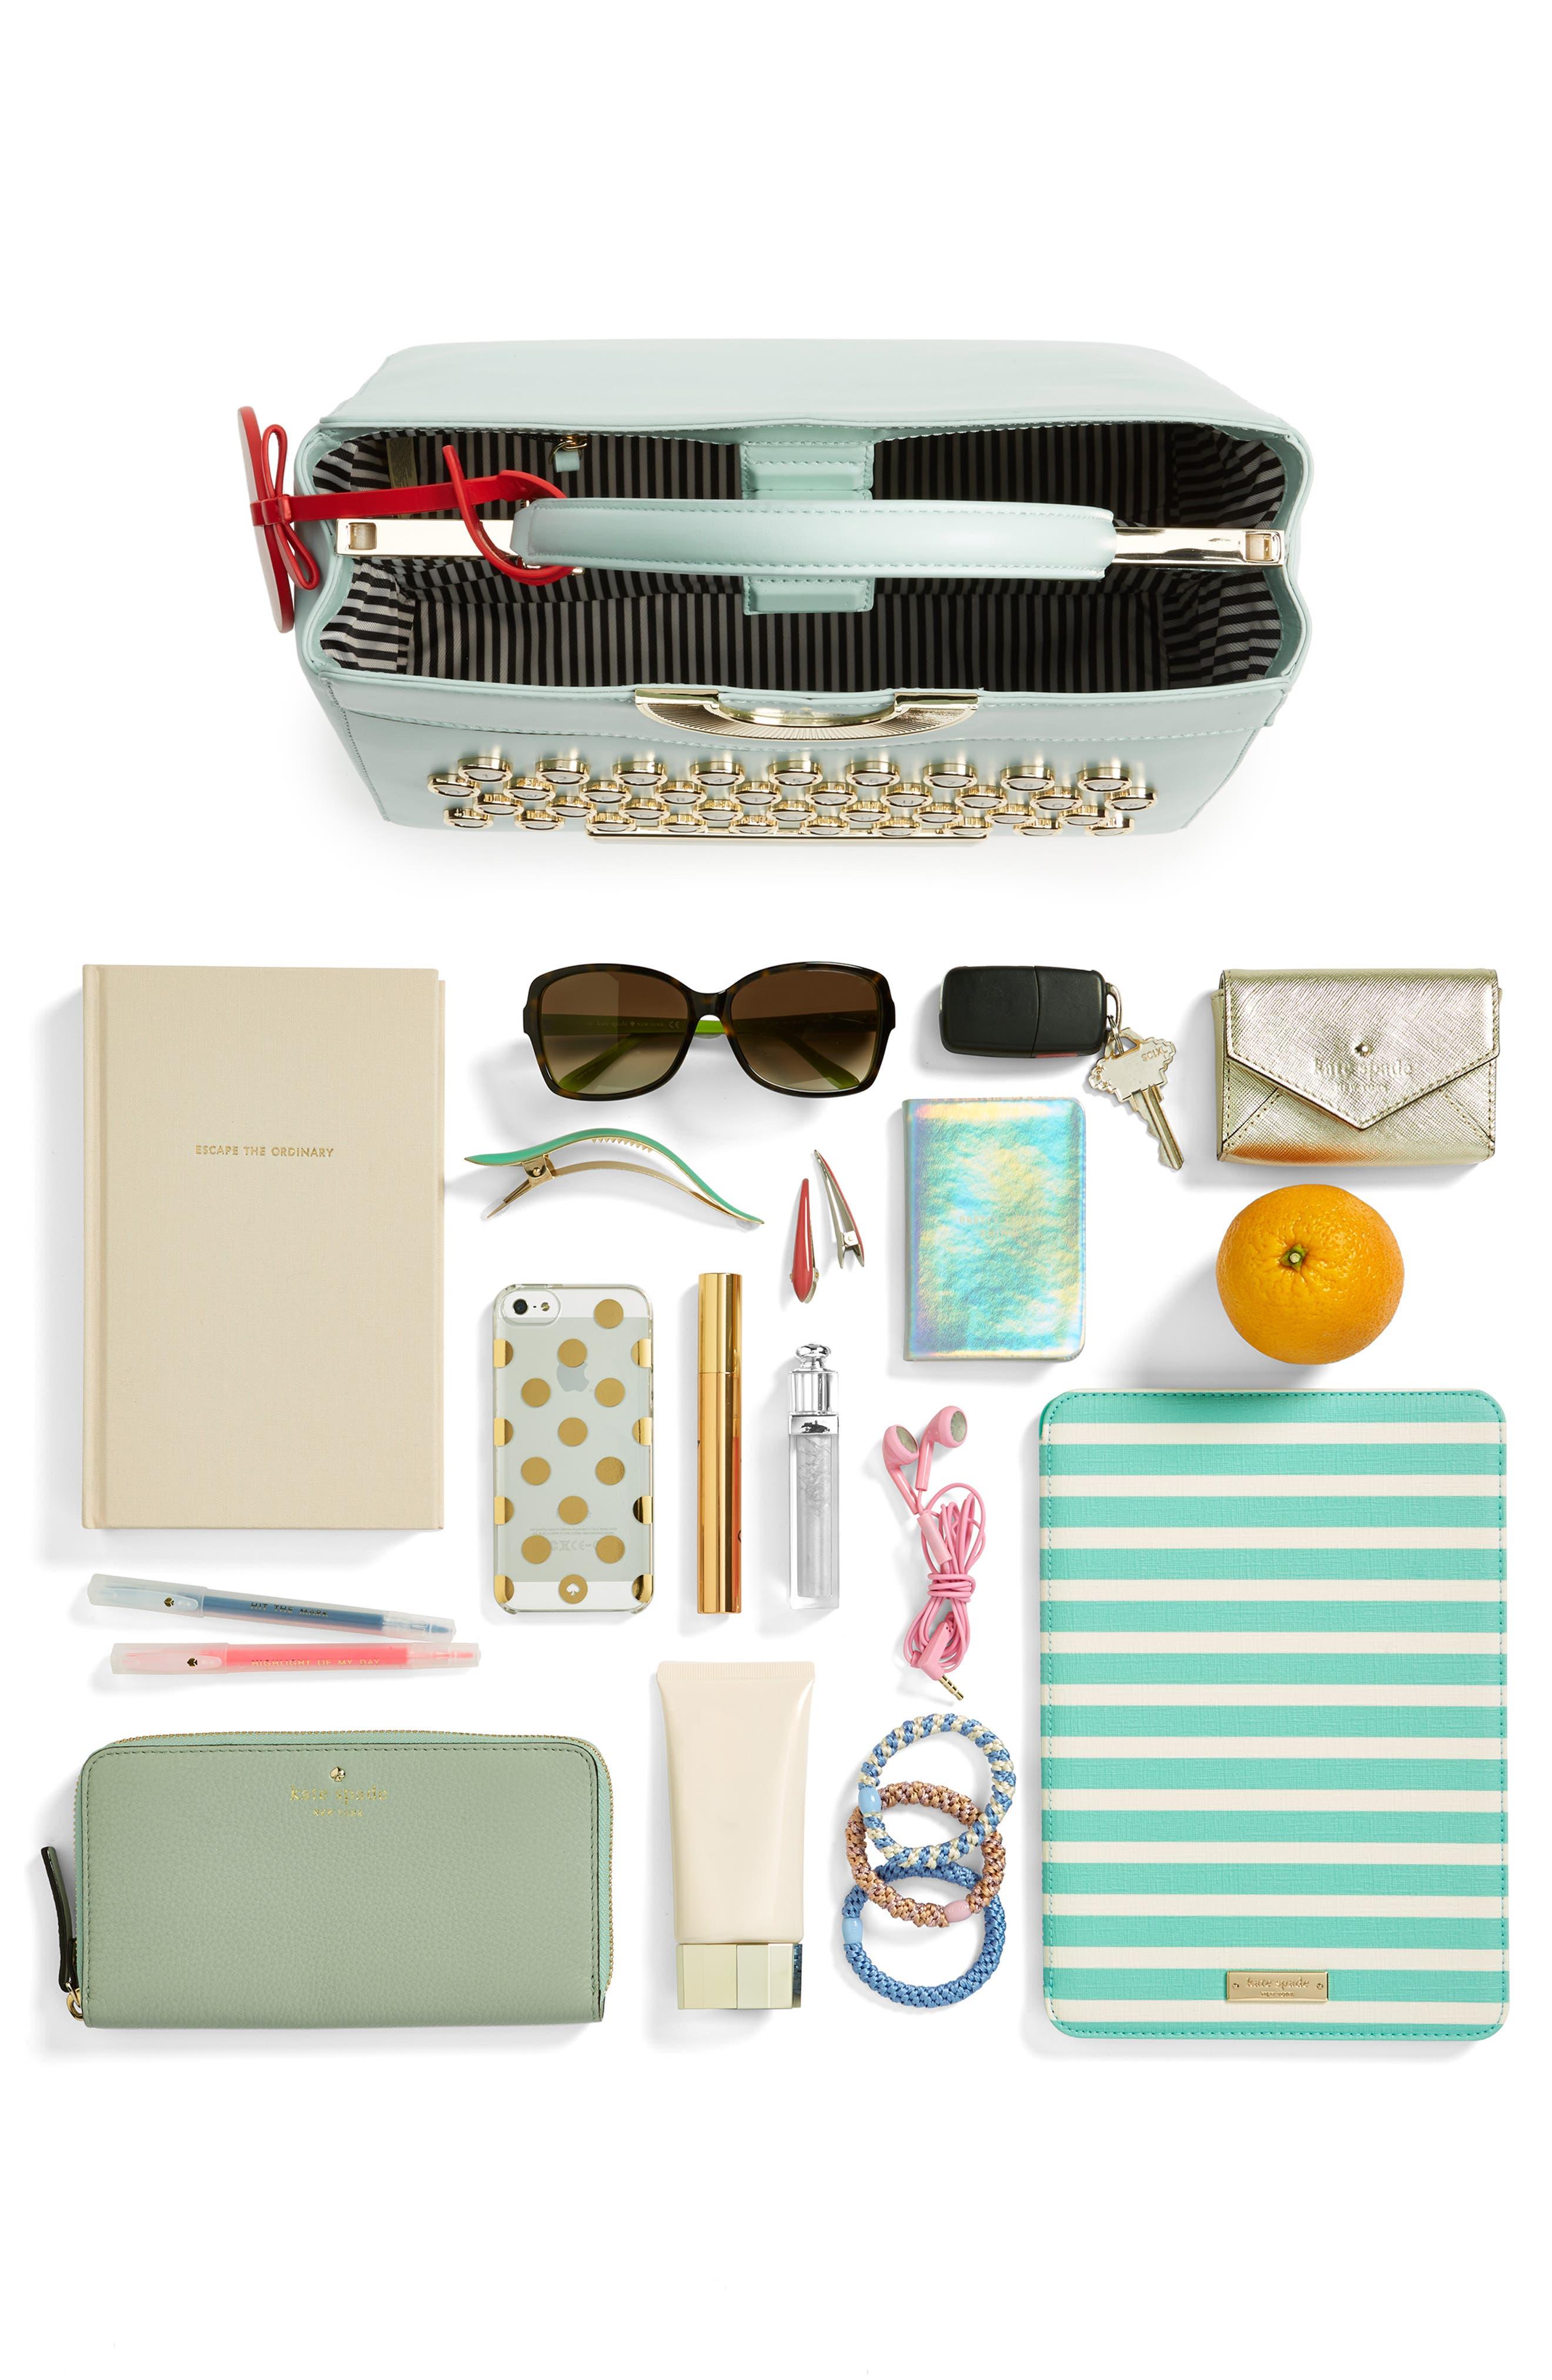 be mine - typewriter leather satchel,                             Alternate thumbnail 3, color,                             474